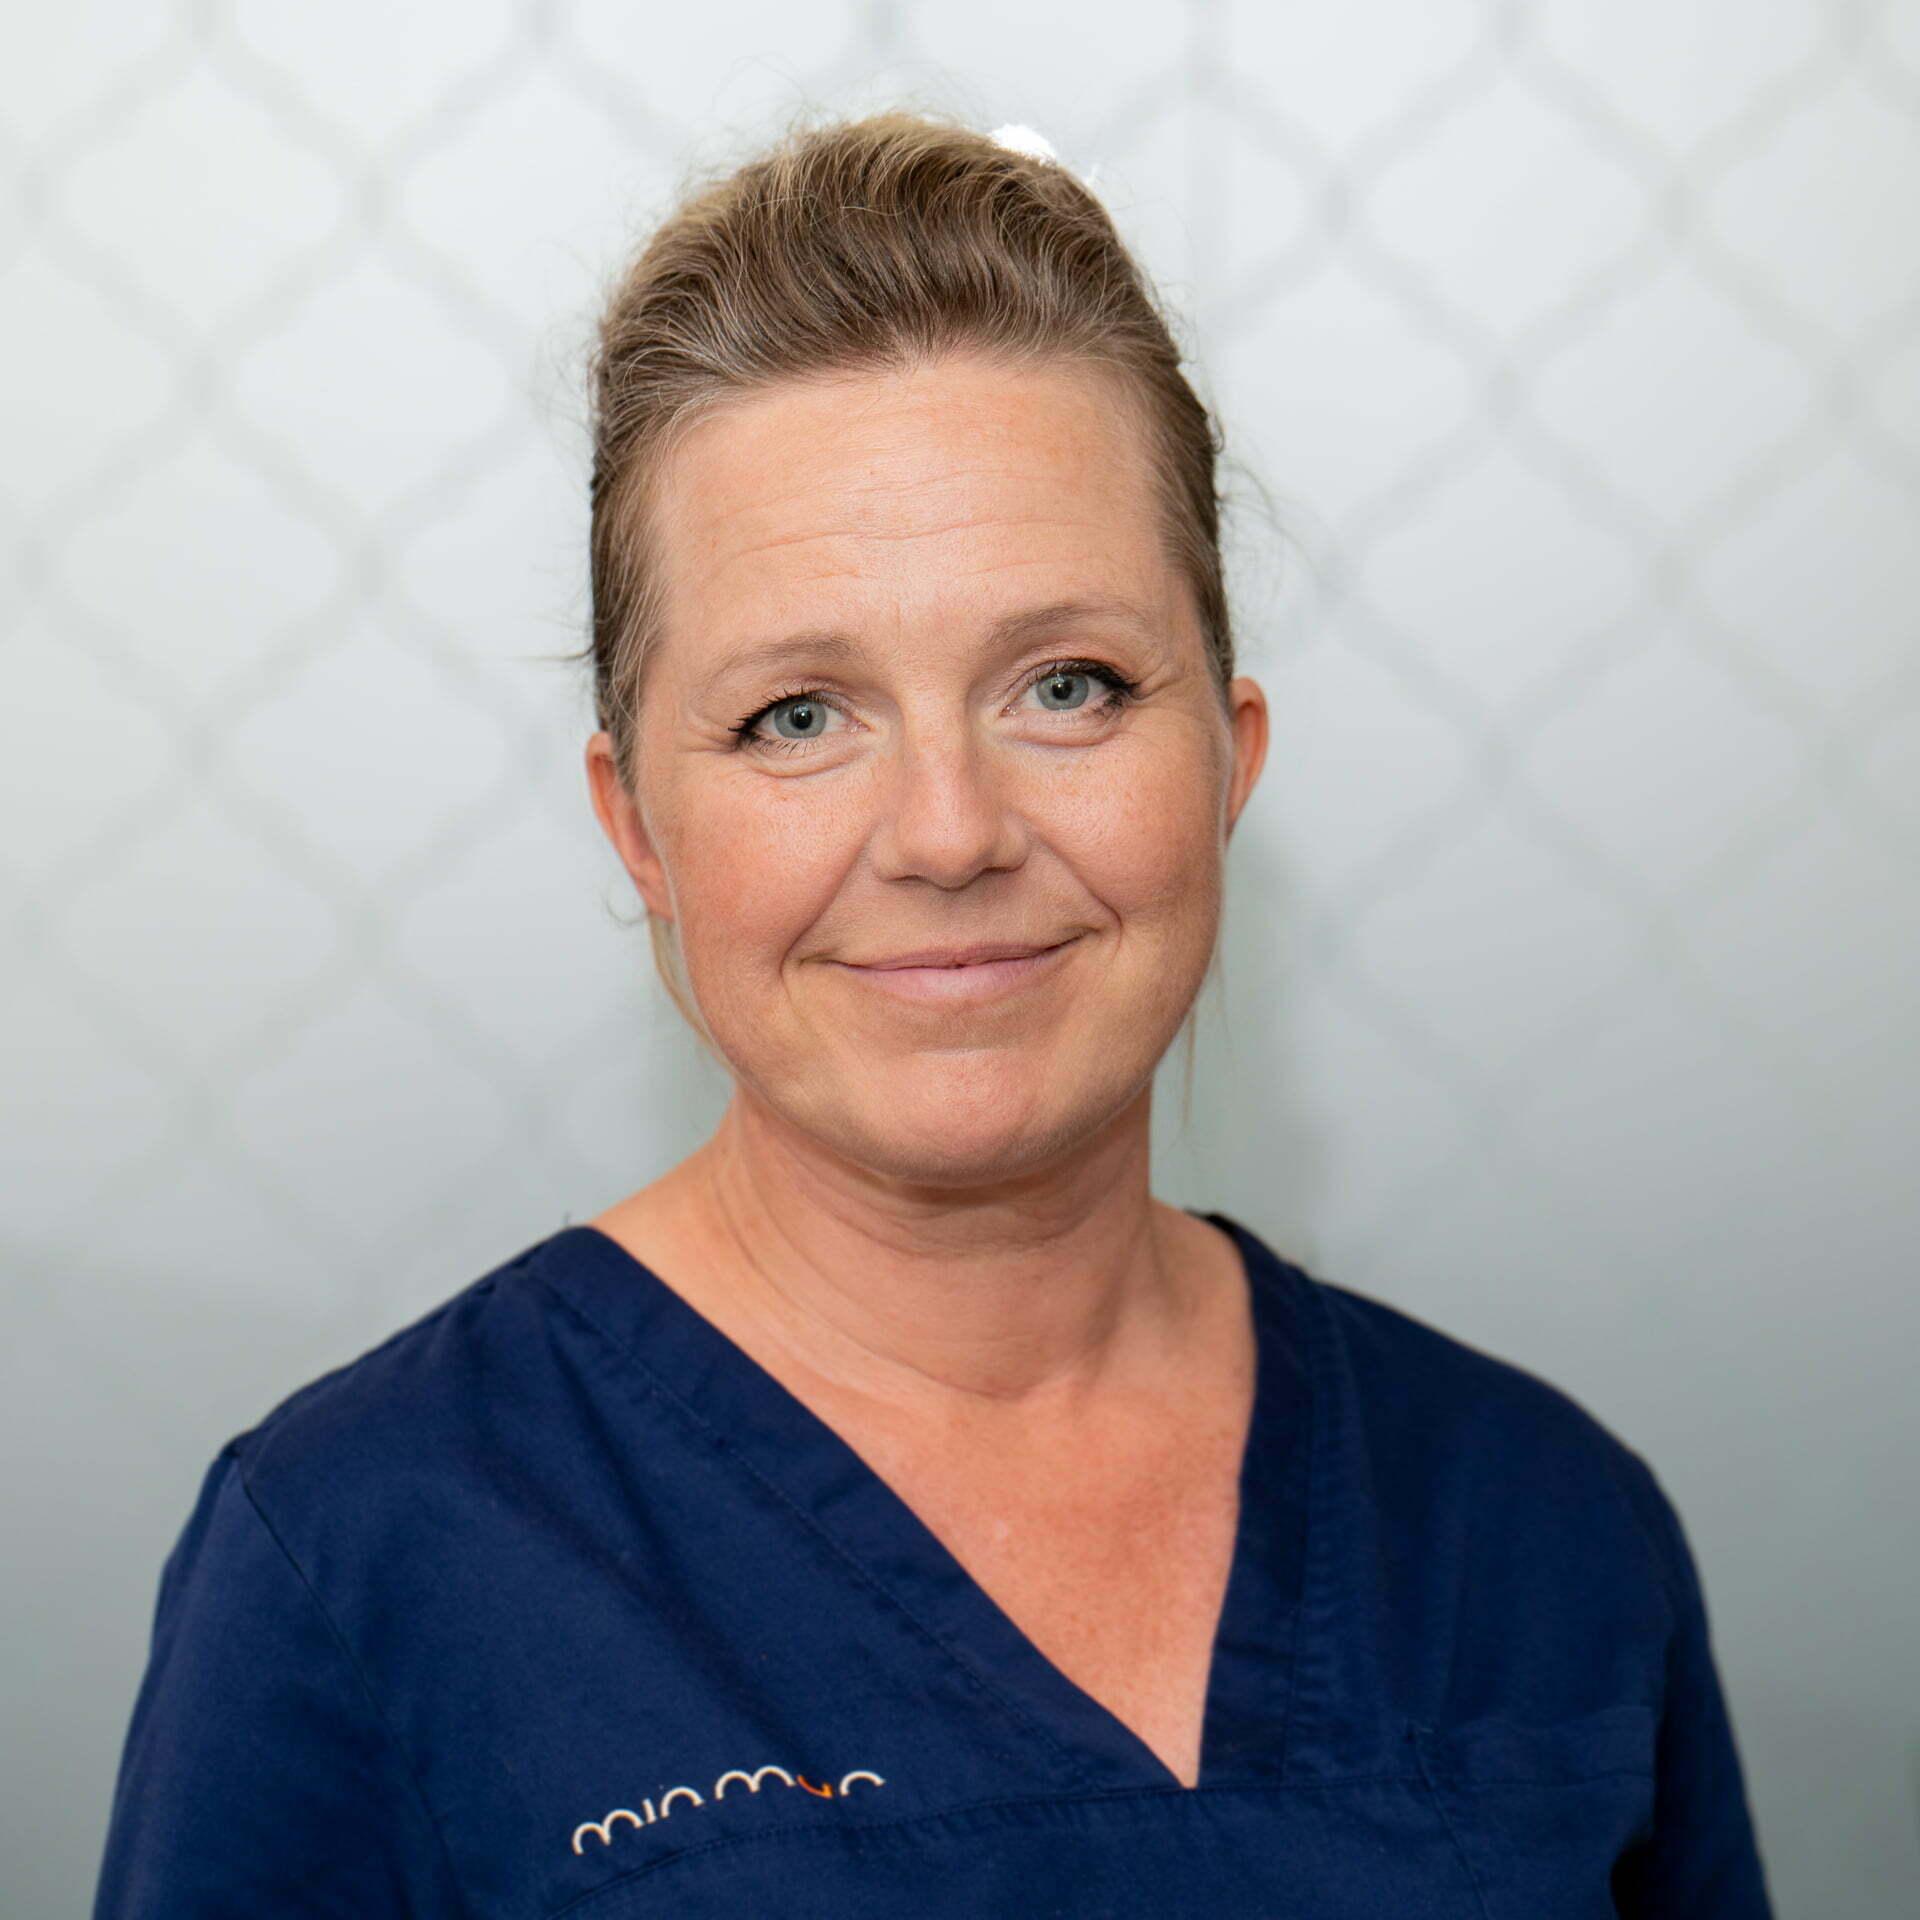 Leg. Tandhygienist Jeanette Winberg